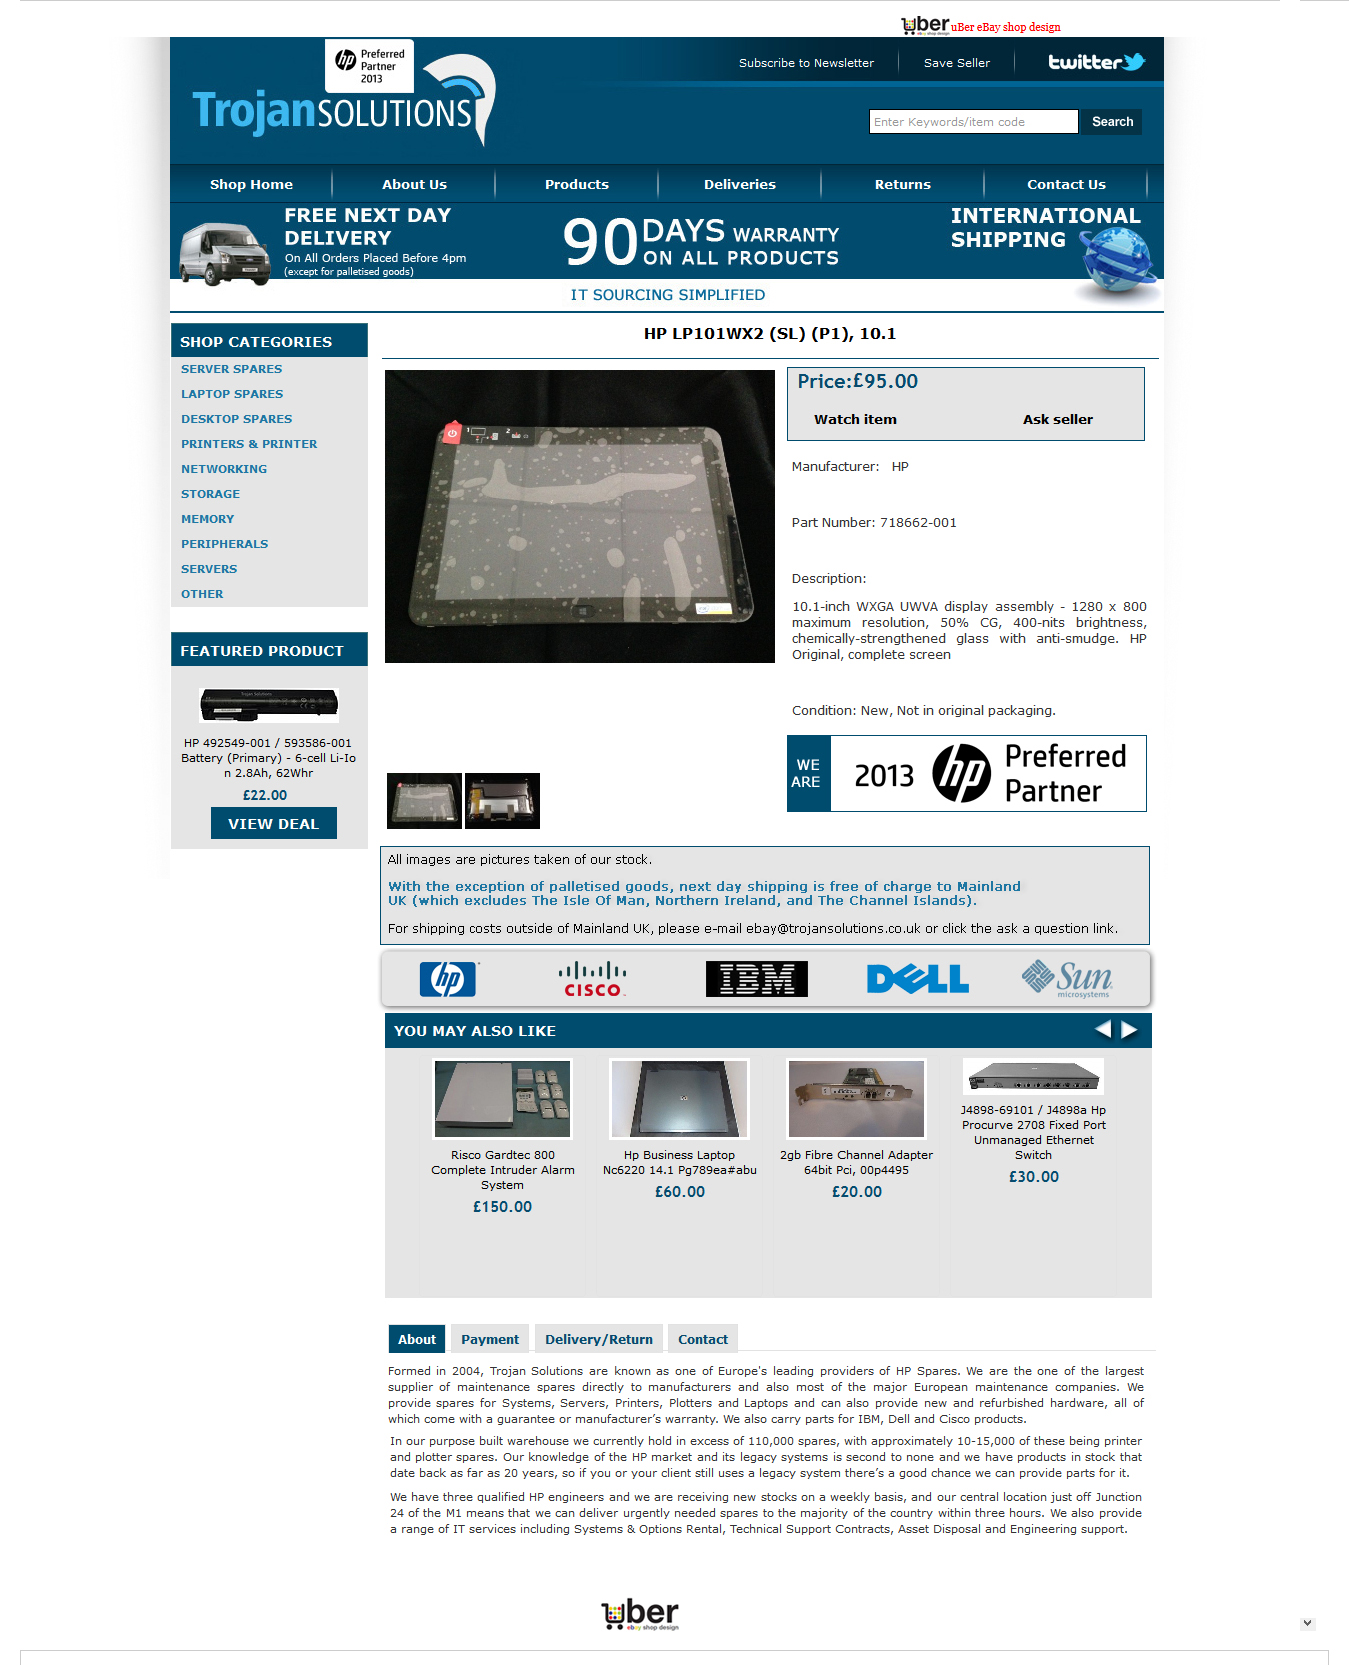 Trojan Solutions ebay item page